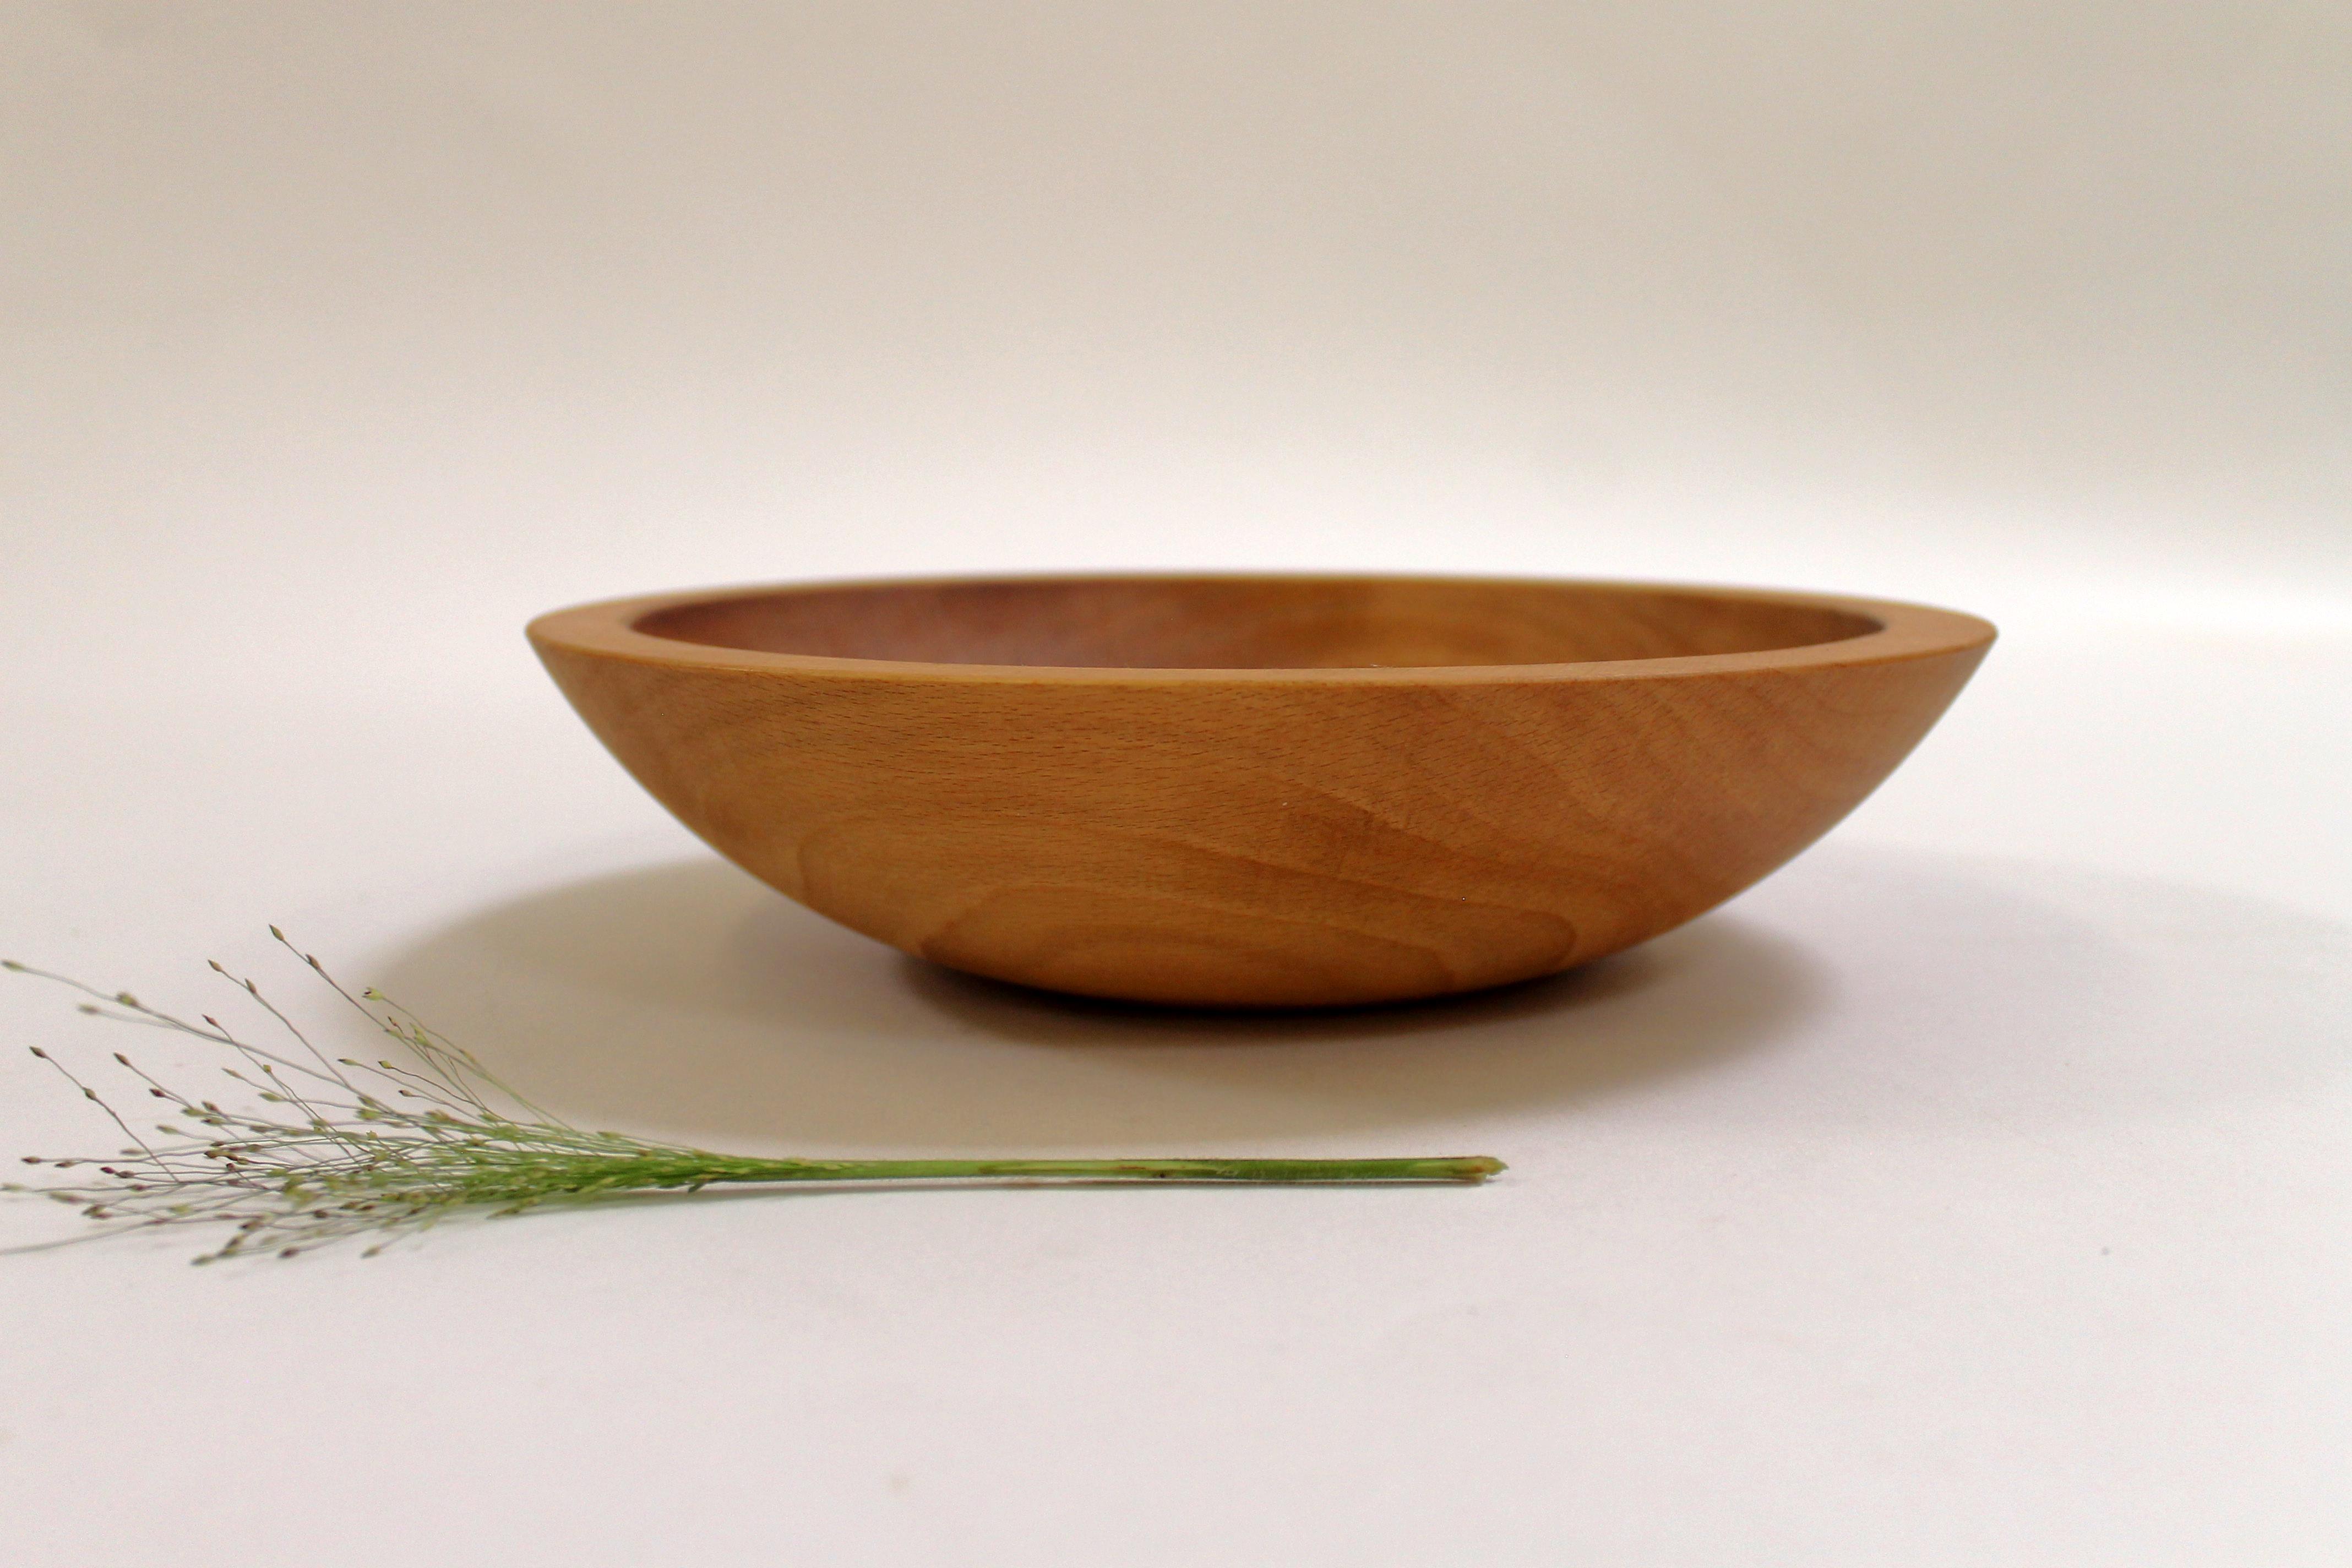 9 inch Beech Bowl - Light Walnut & Bee's Oil Finish 109WBLT